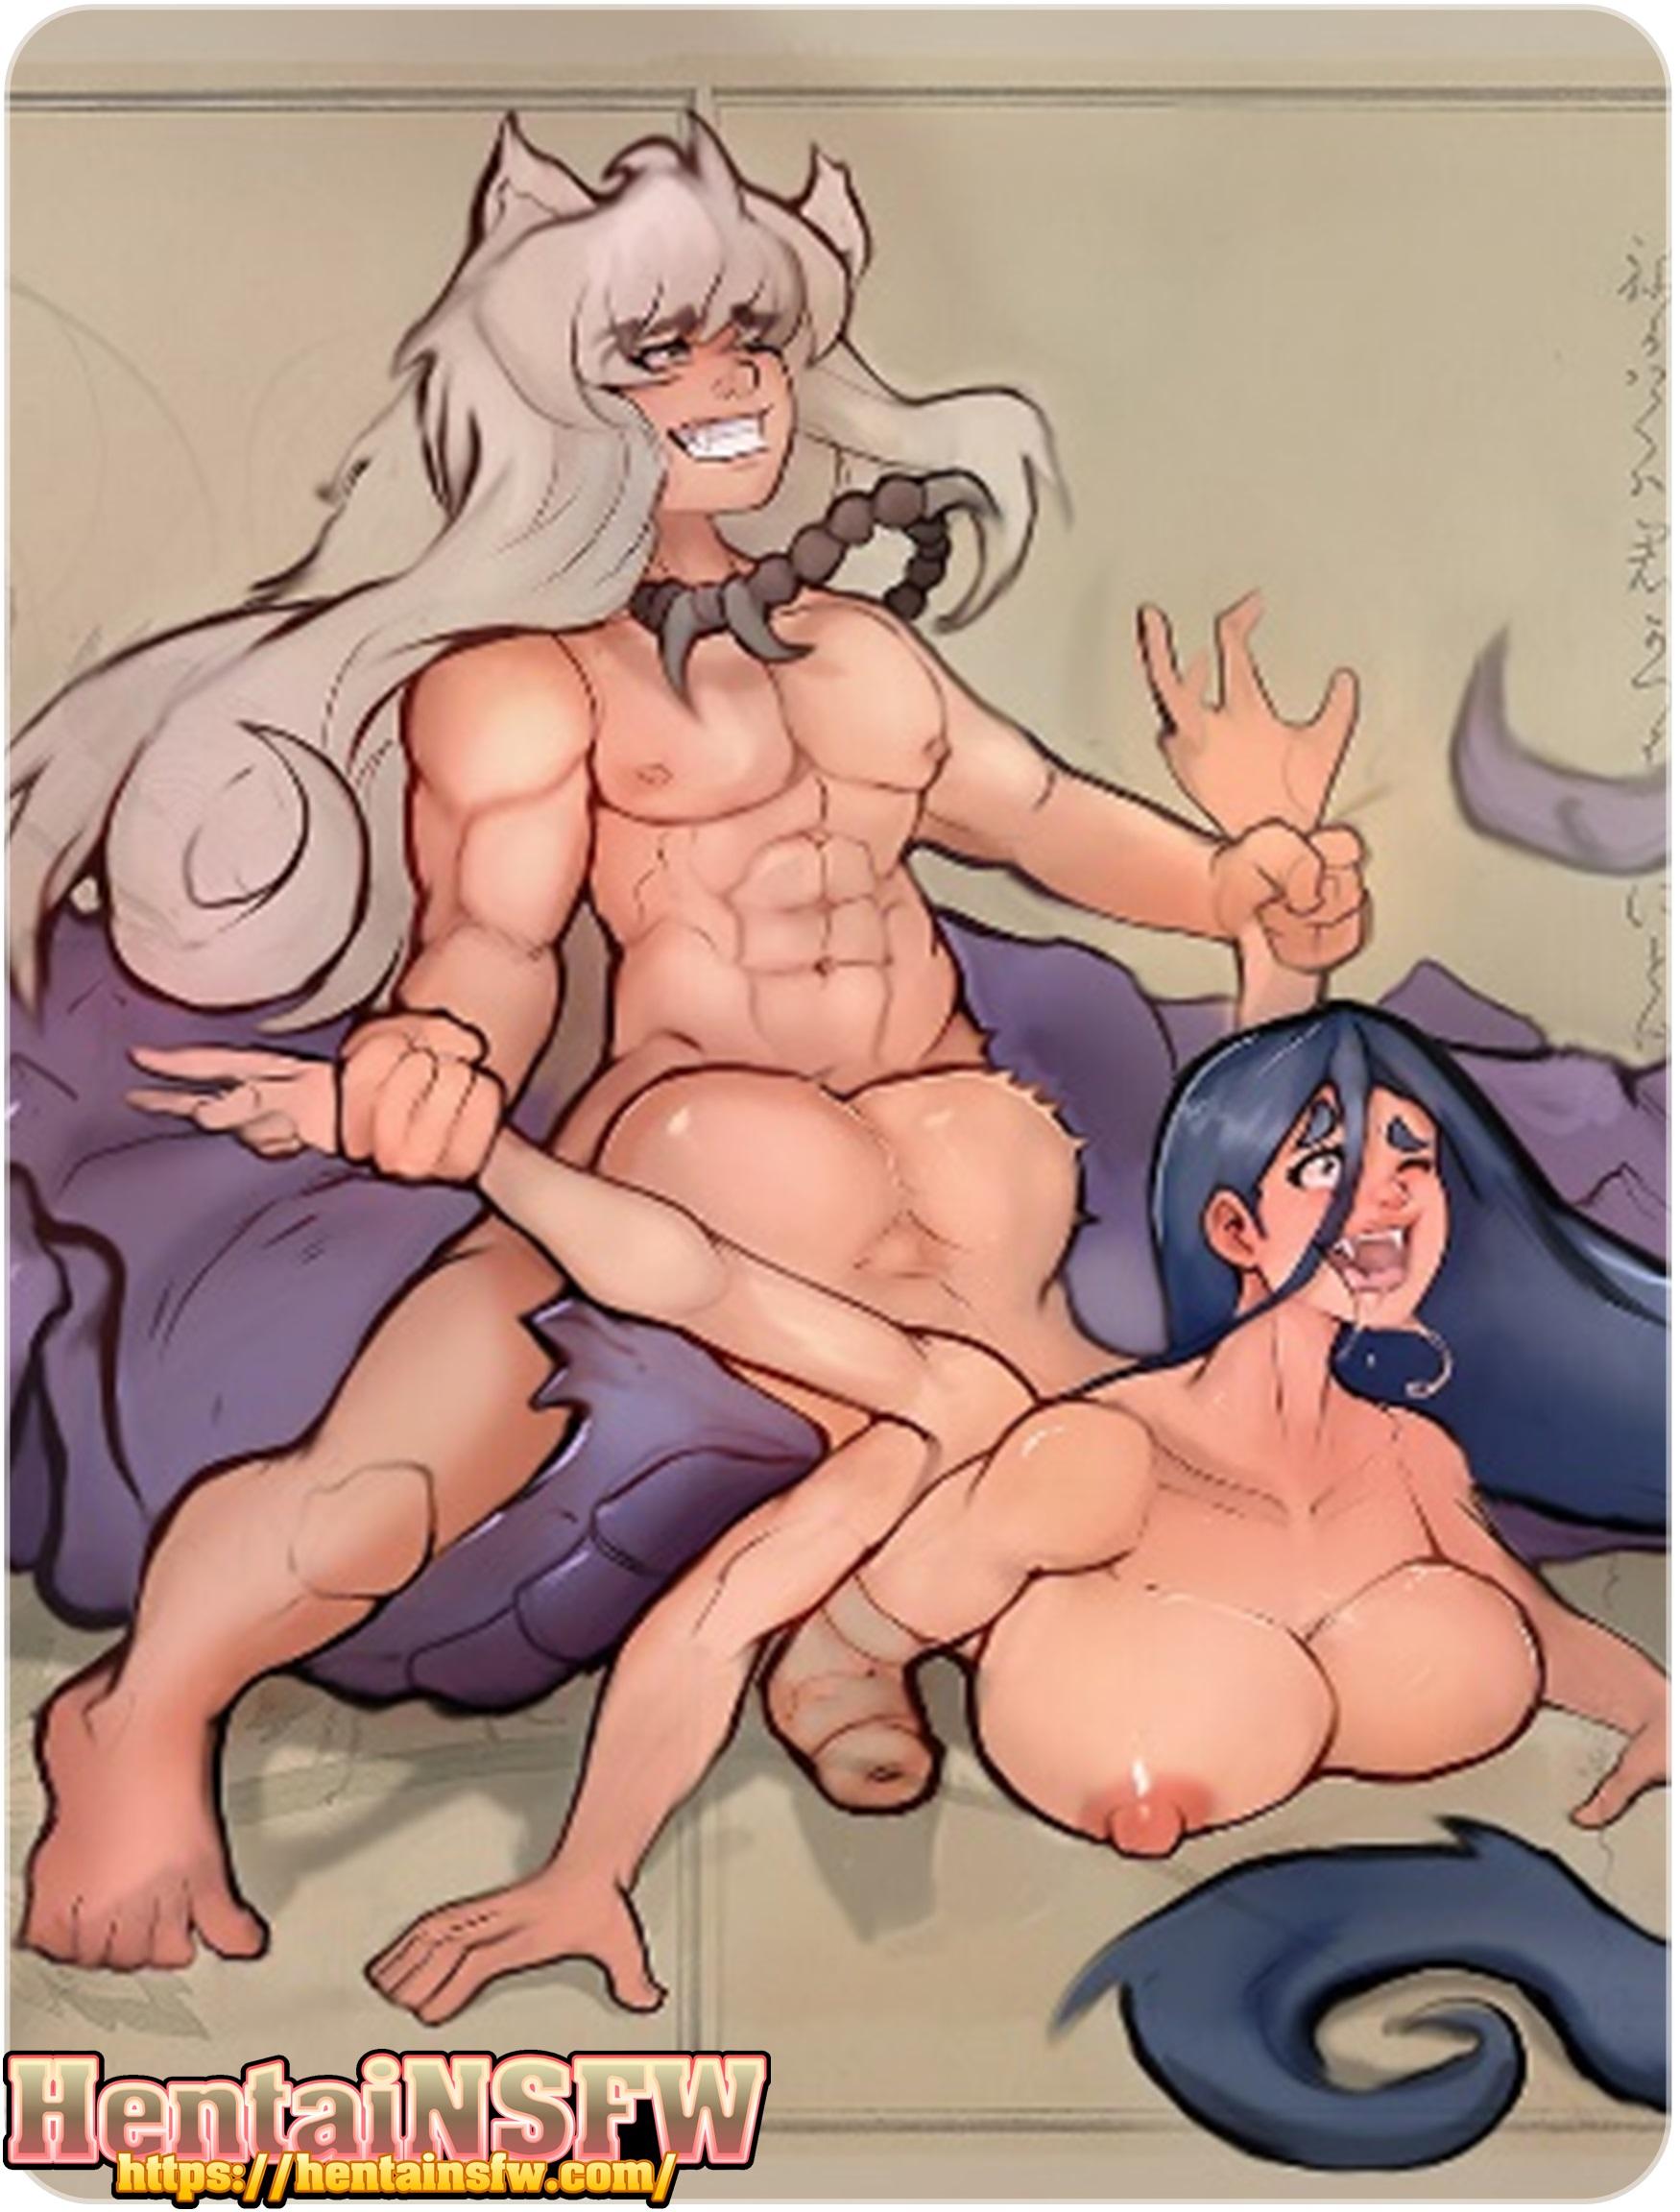 oppaihentaiNSFW inuyashafuckingmistresscentipede animemanga sexxxx cartoonpornart